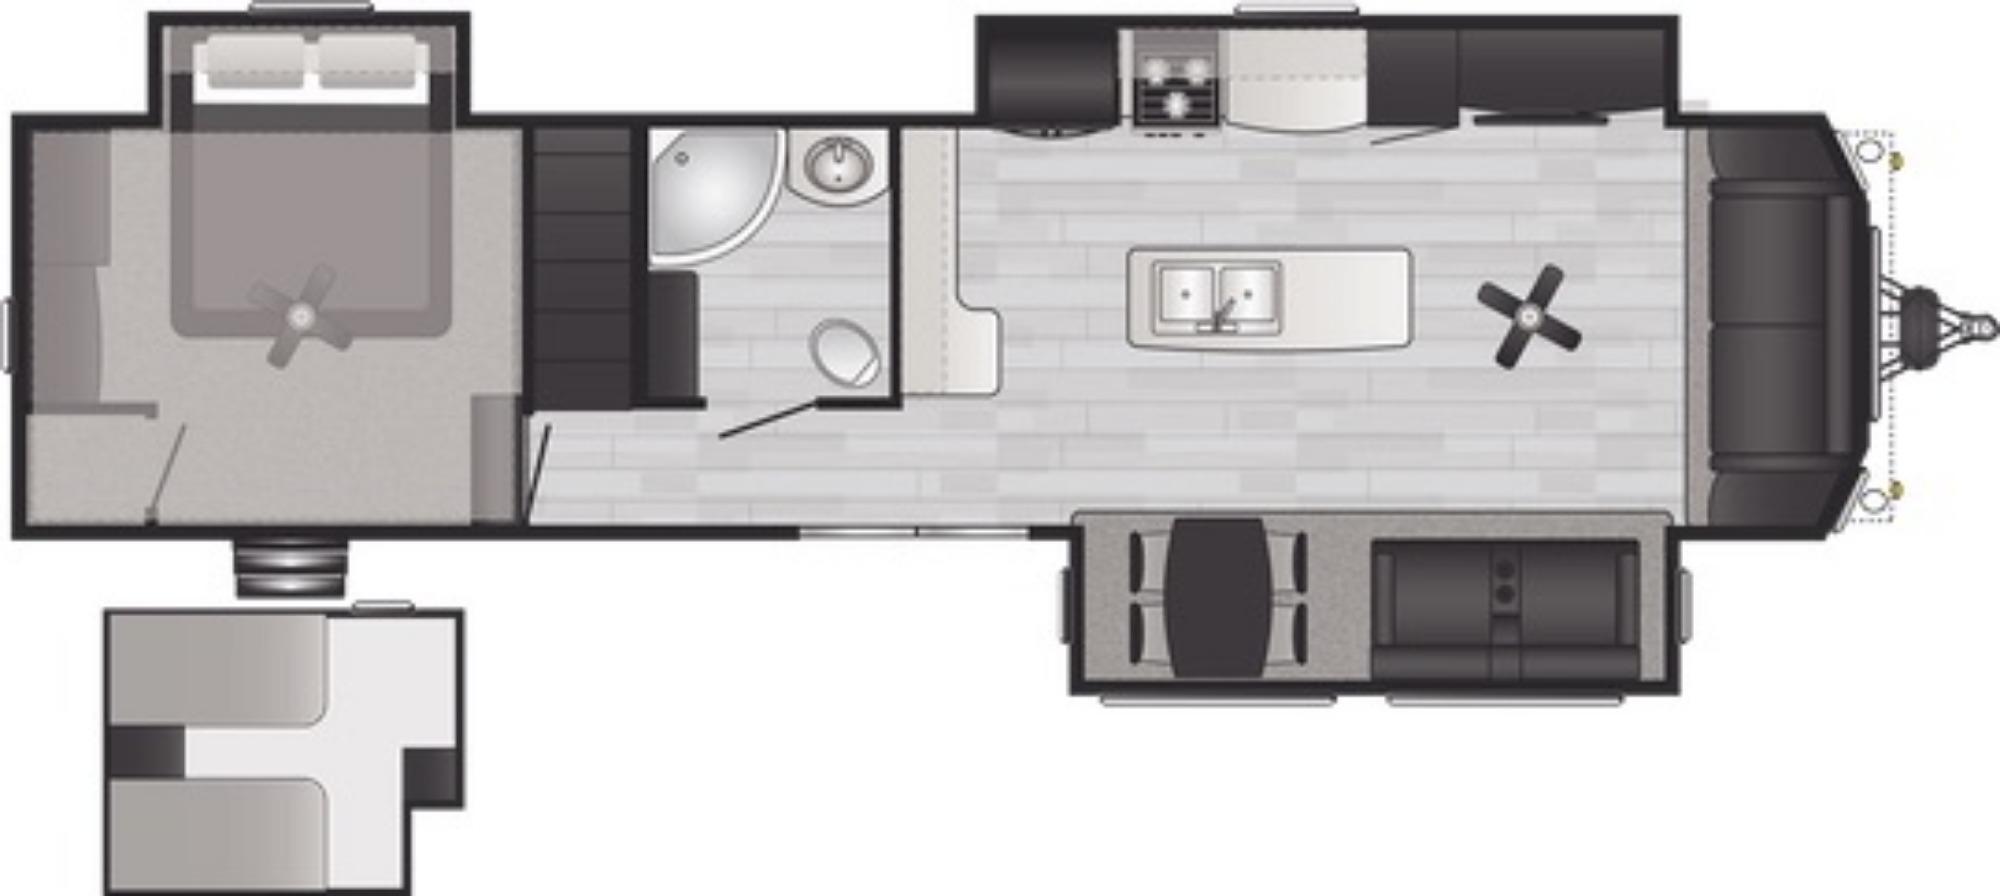 View Floor Plan for 2021 KEYSTONE RETREAT 391LOFT